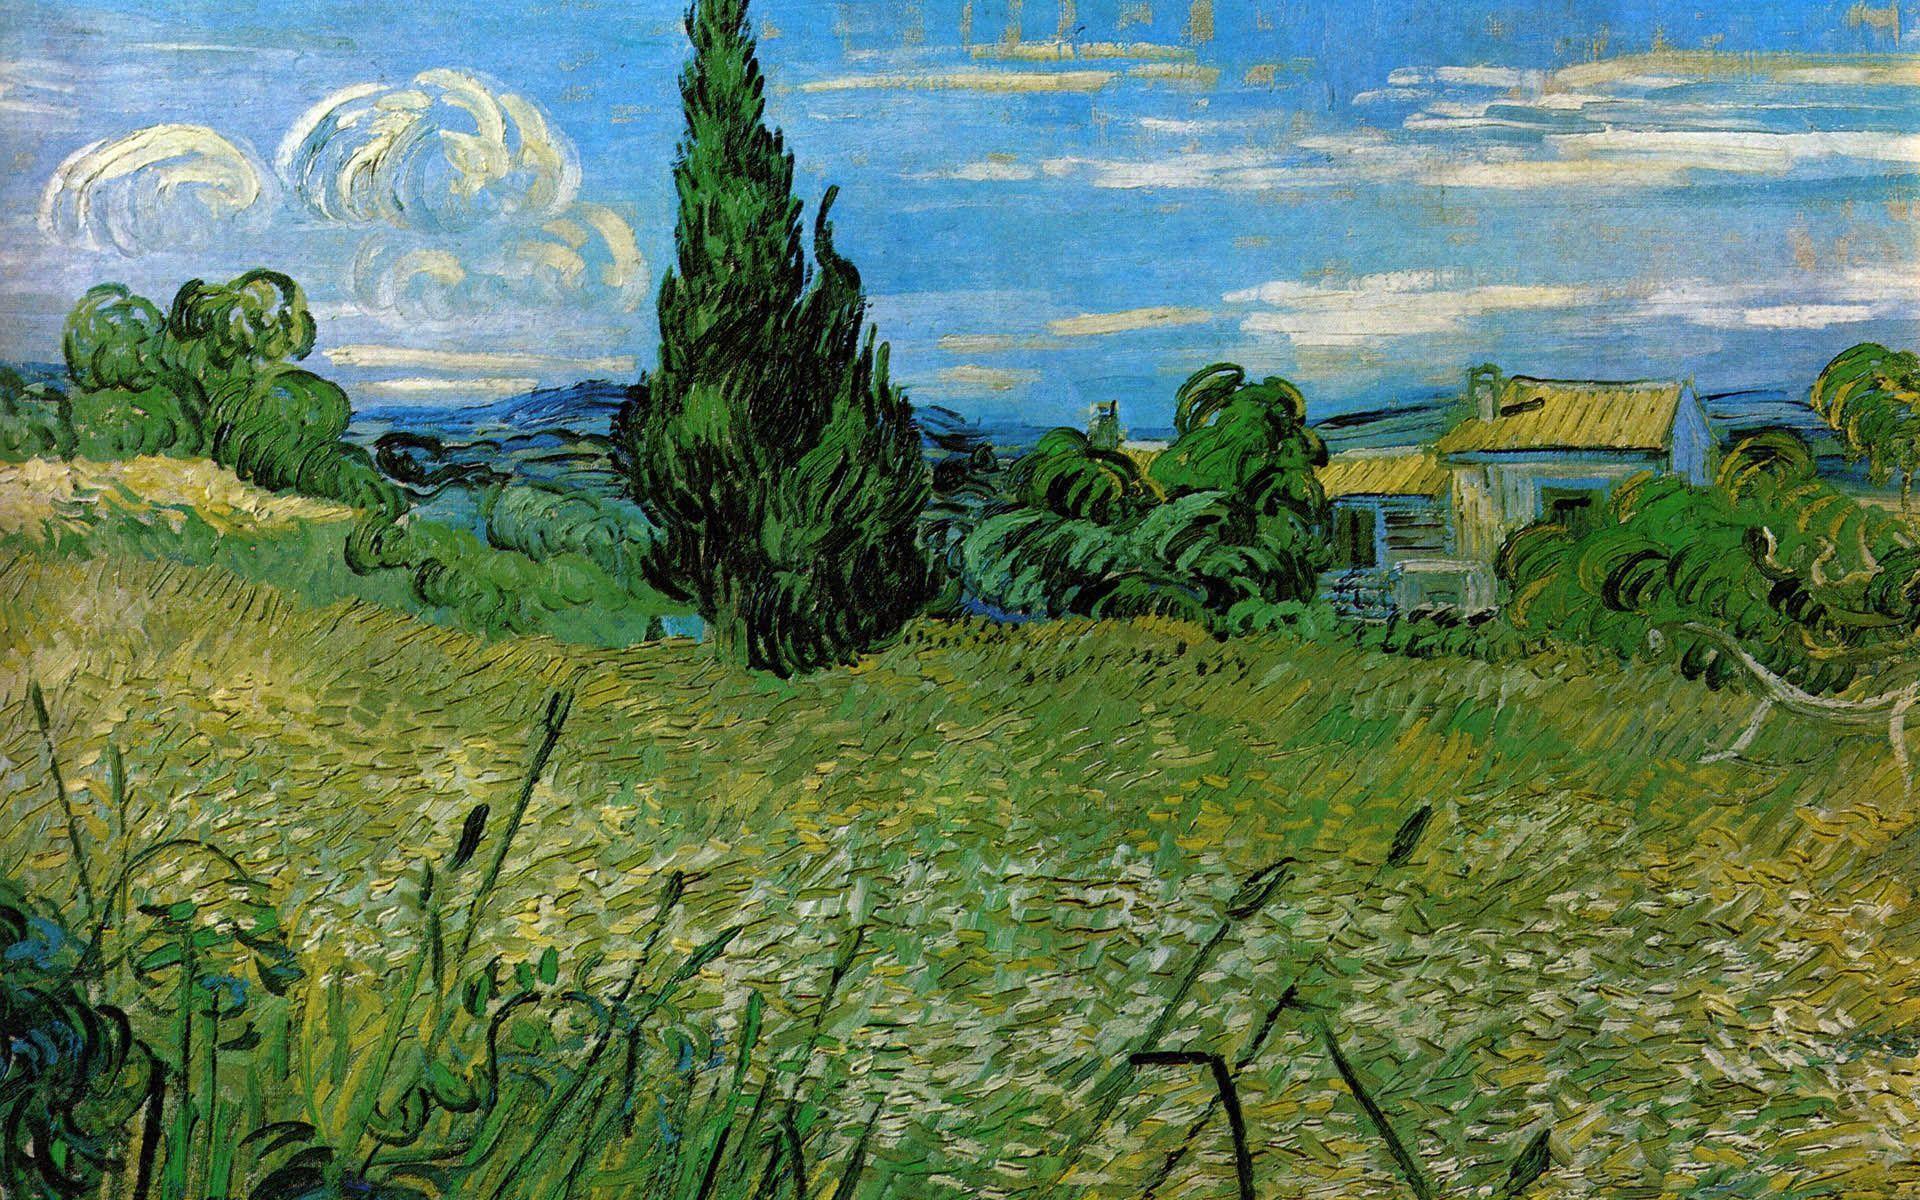 Wheatfield With Cypresses Wallpaper Van Gogh Desktop Wallp...